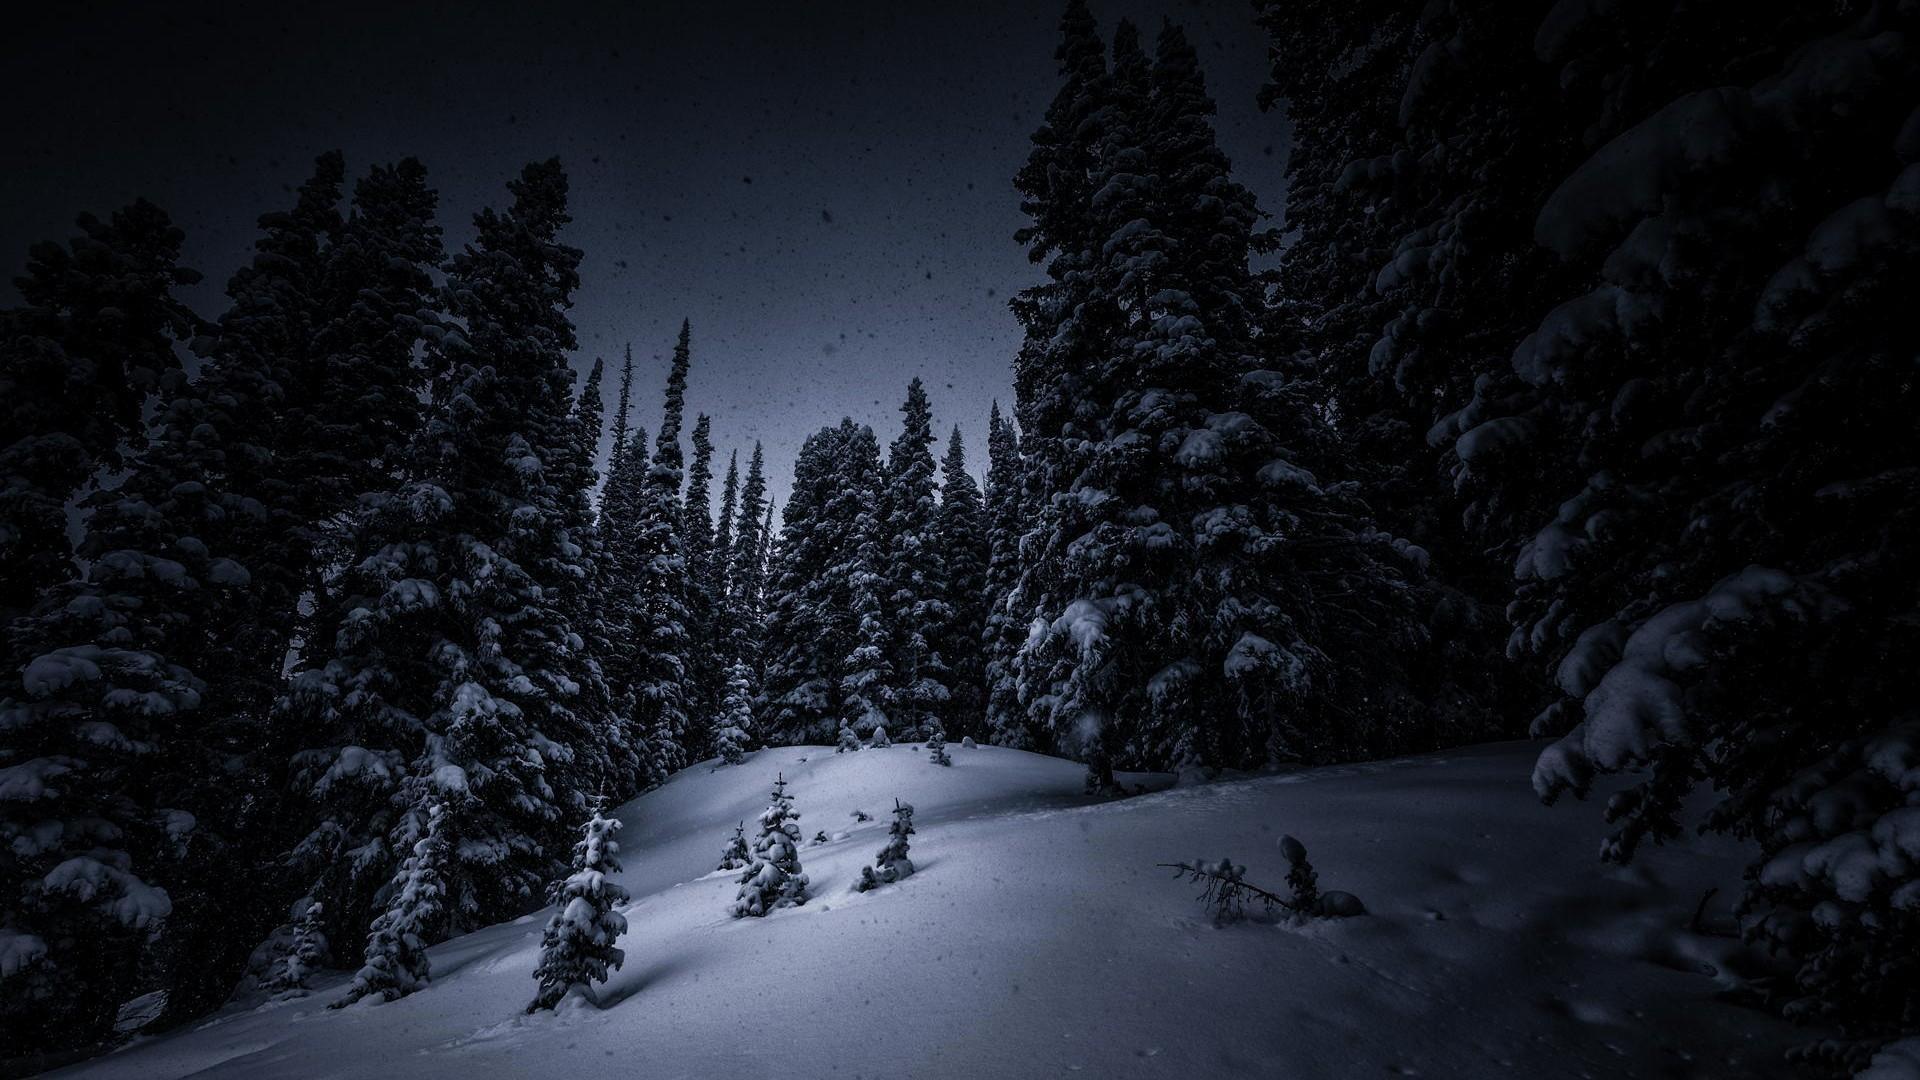 Fall Tree And Black Fence Wallpaper Die 91 Besten Dunkle Hintergrundbilder Hd